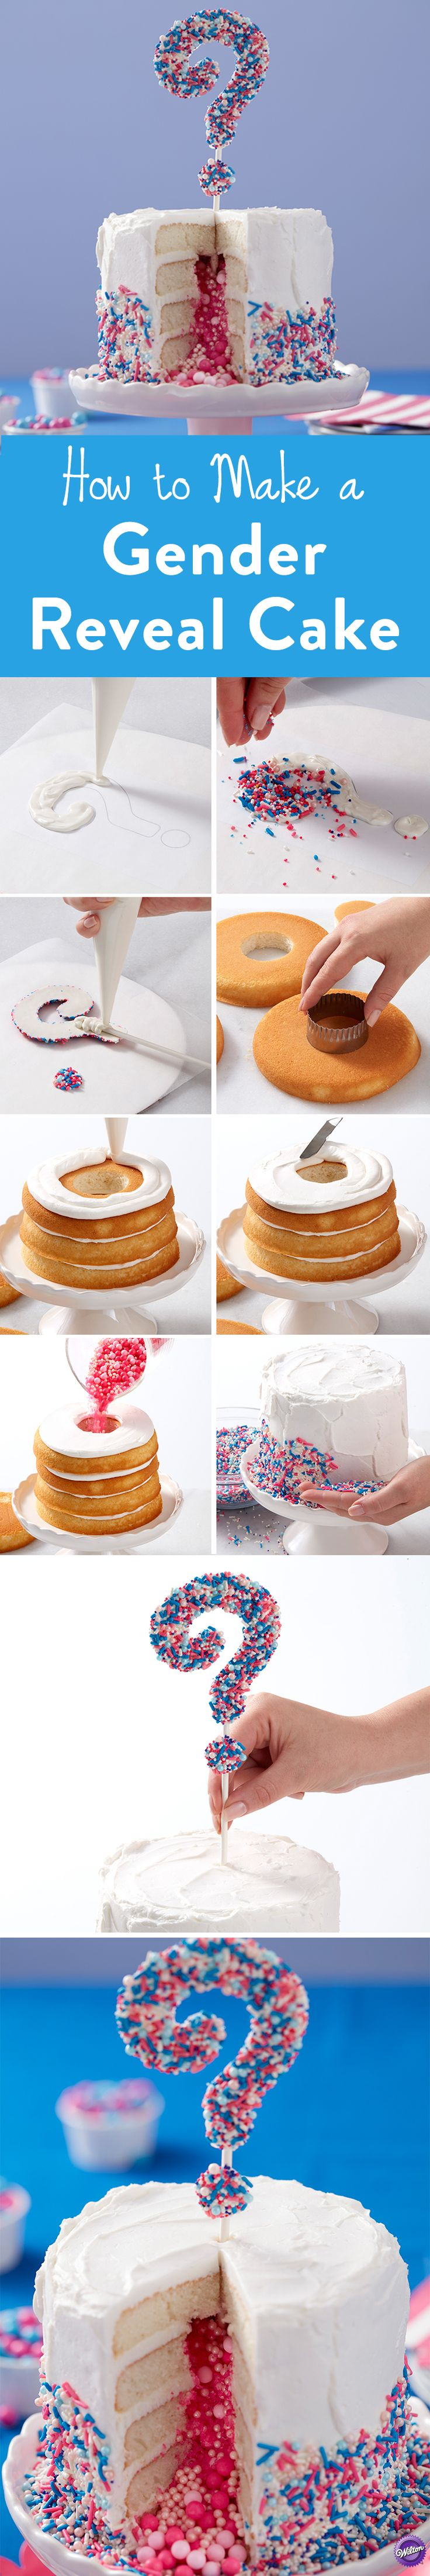 351 best Cake ideas images on Pinterest